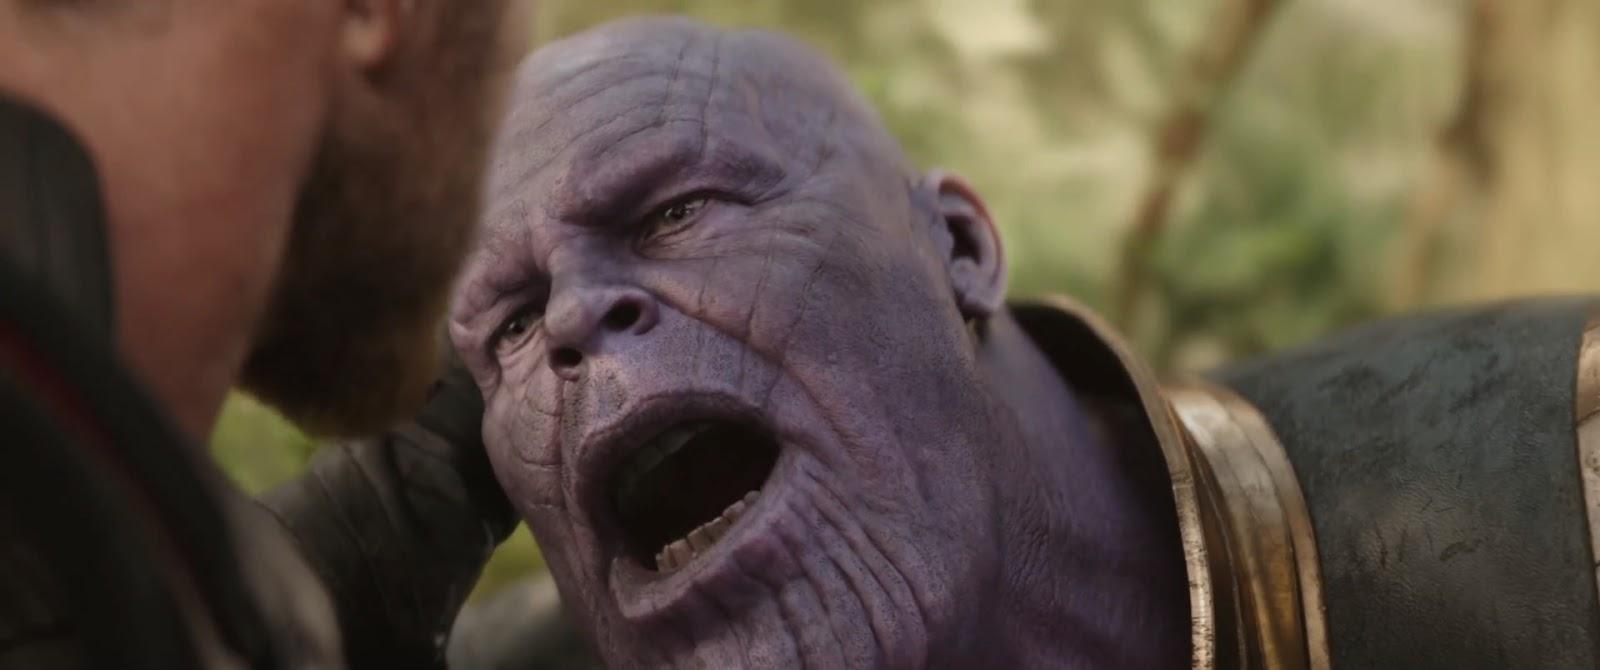 Avengers: Infinity War (2018) 4